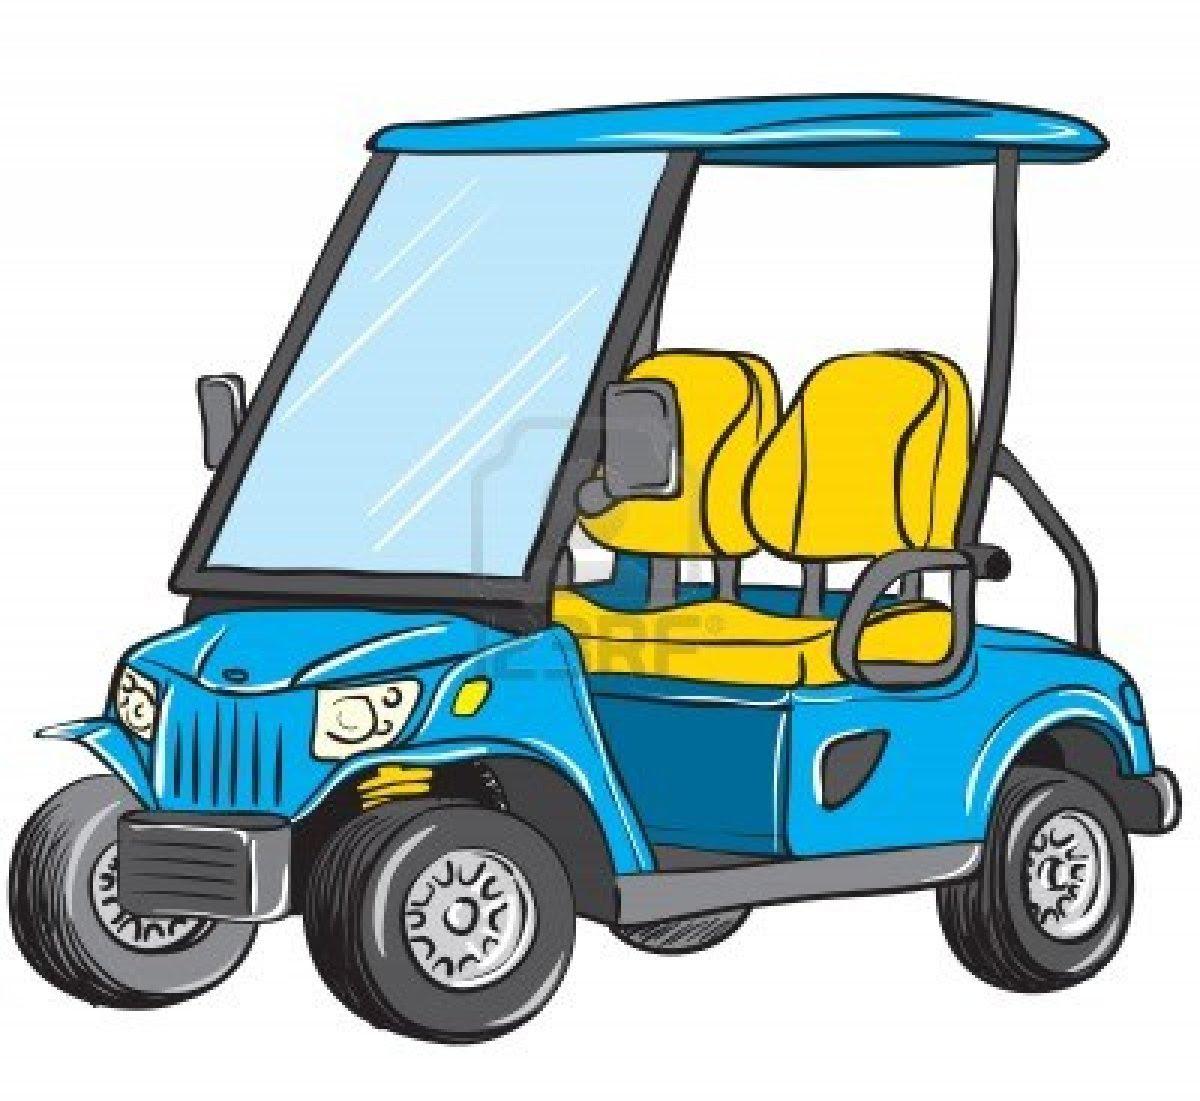 Club Car Precedent Tires, Images For Golf Cart Clip Art Vector, Club Car Precedent Tires